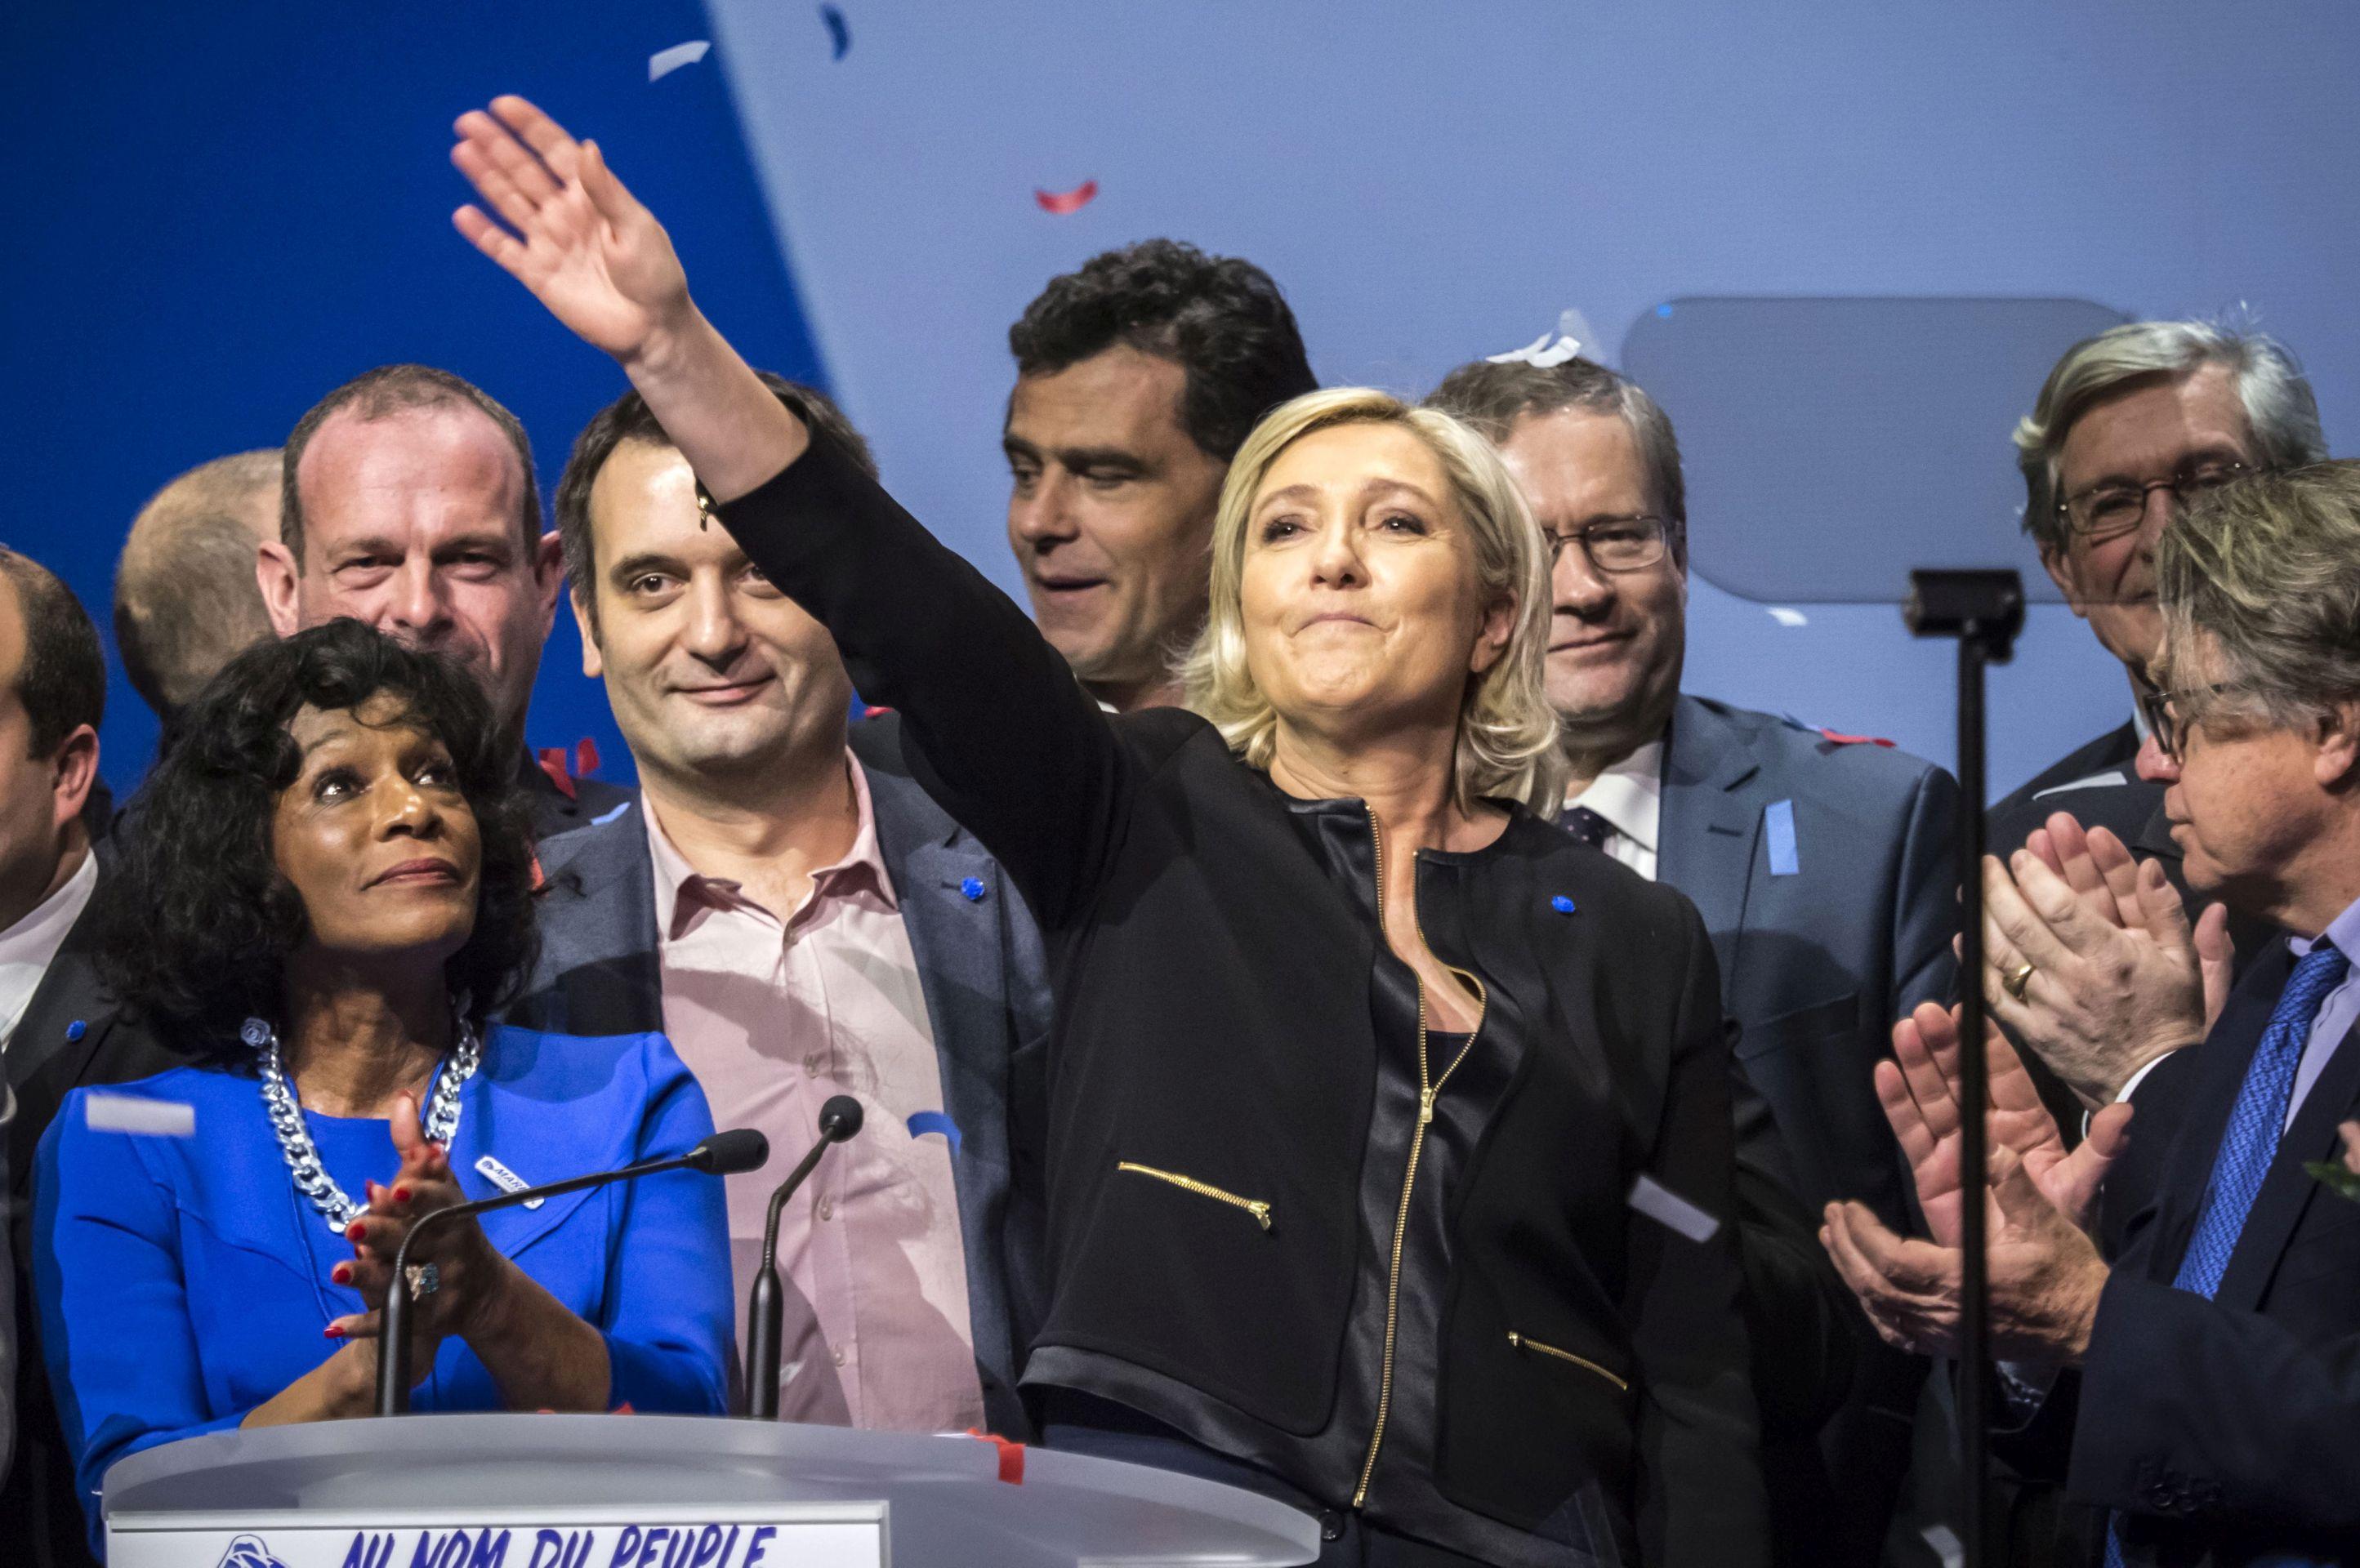 Le Pen protiv EU-a, migranata, globalizacije